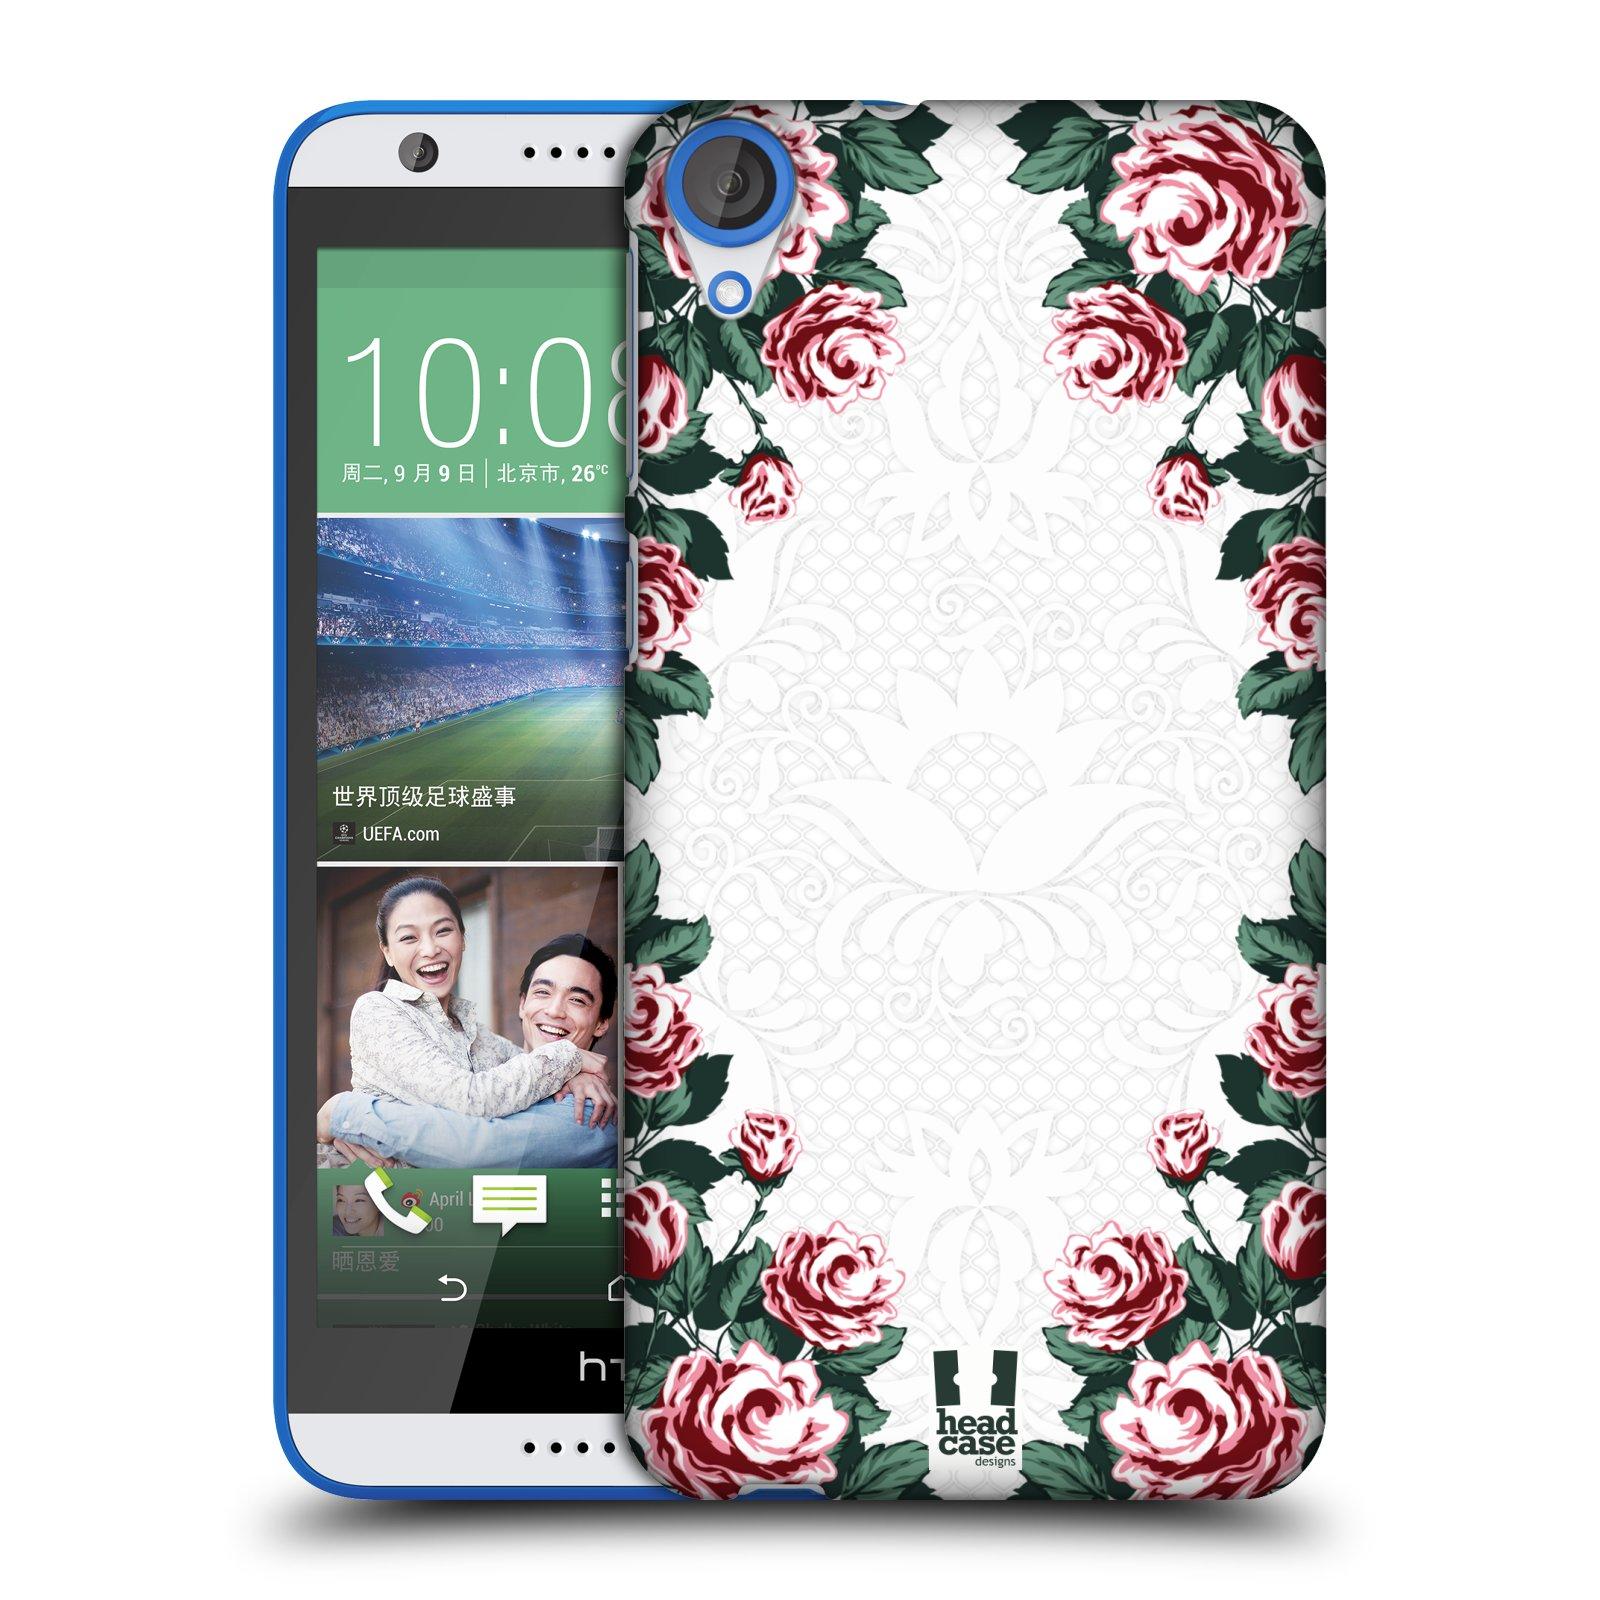 HEAD CASE DESIGNS FLORAL ART DECO HARD BACK CASE FOR HTC DESIRE 820